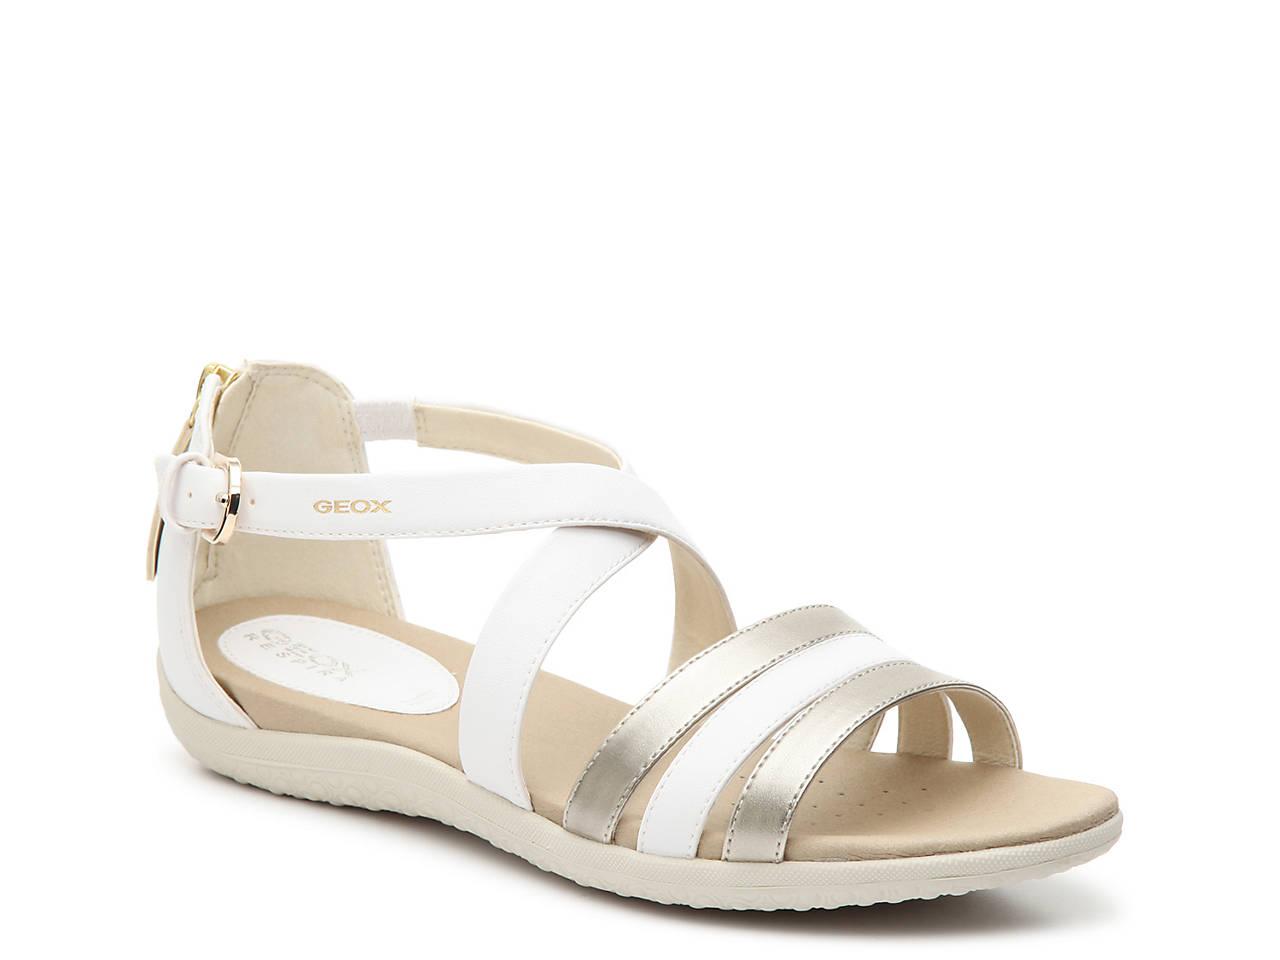 Women's Vega Rcowexdb Vnm80wyno Shoesdsw Geox Sandal R35AL4j